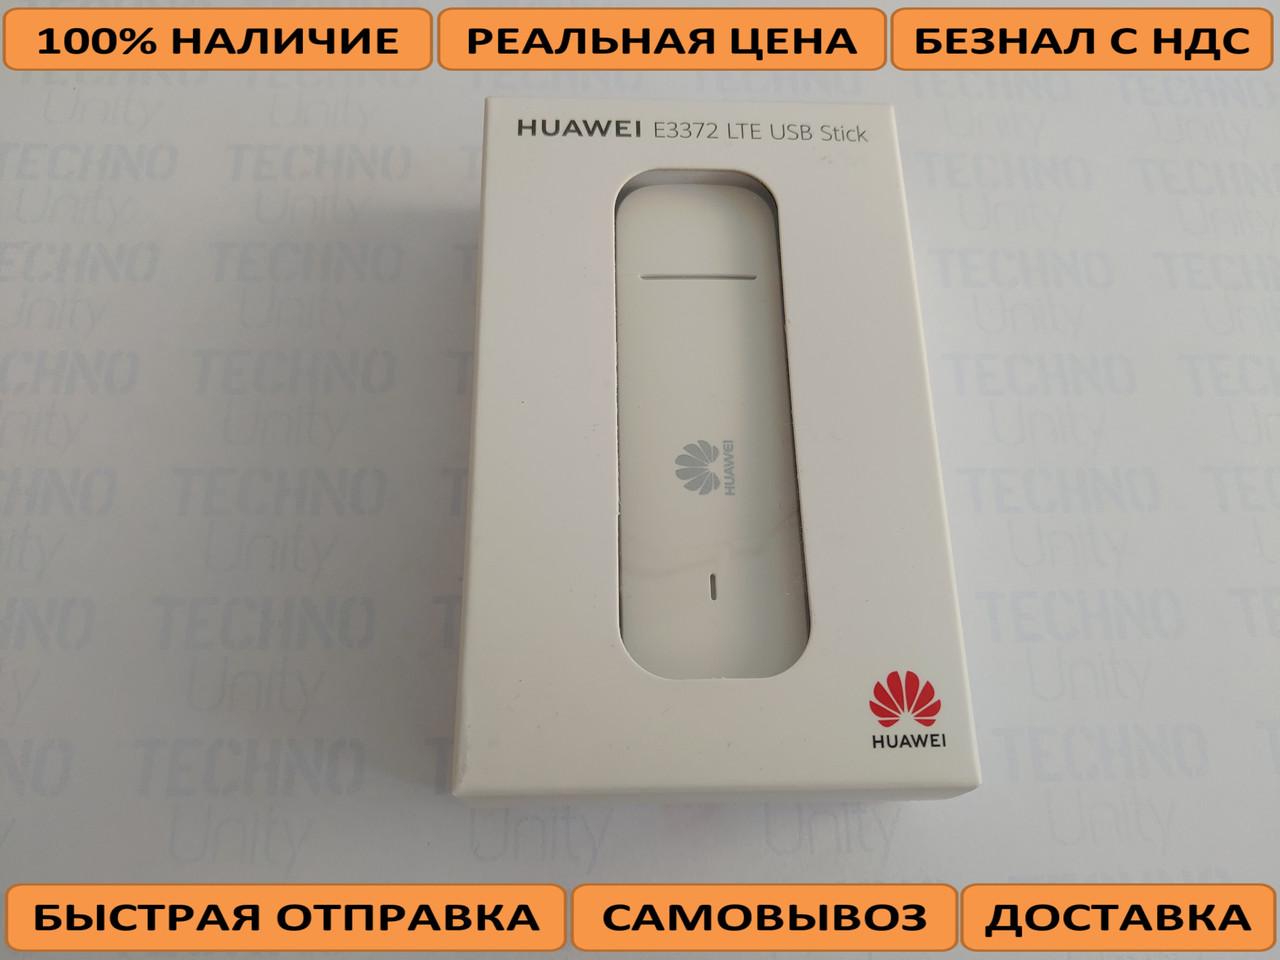 4G USB модем Huawei E3372H-320 (51071SQT) LTE HiLink rev. 2020